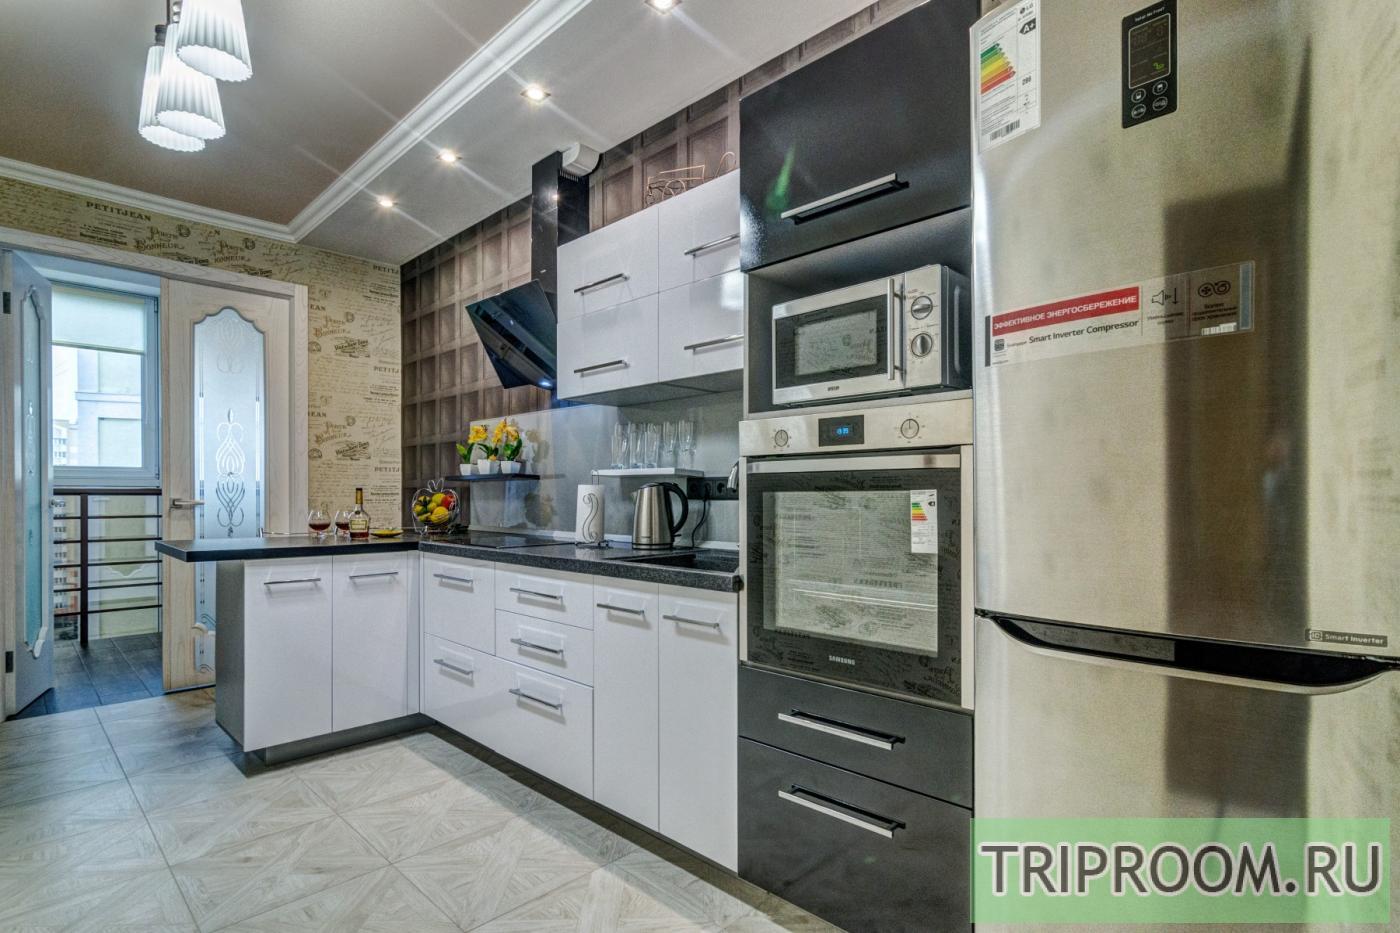 1-комнатная квартира посуточно (вариант № 28442), ул. Суворова улица, фото № 4